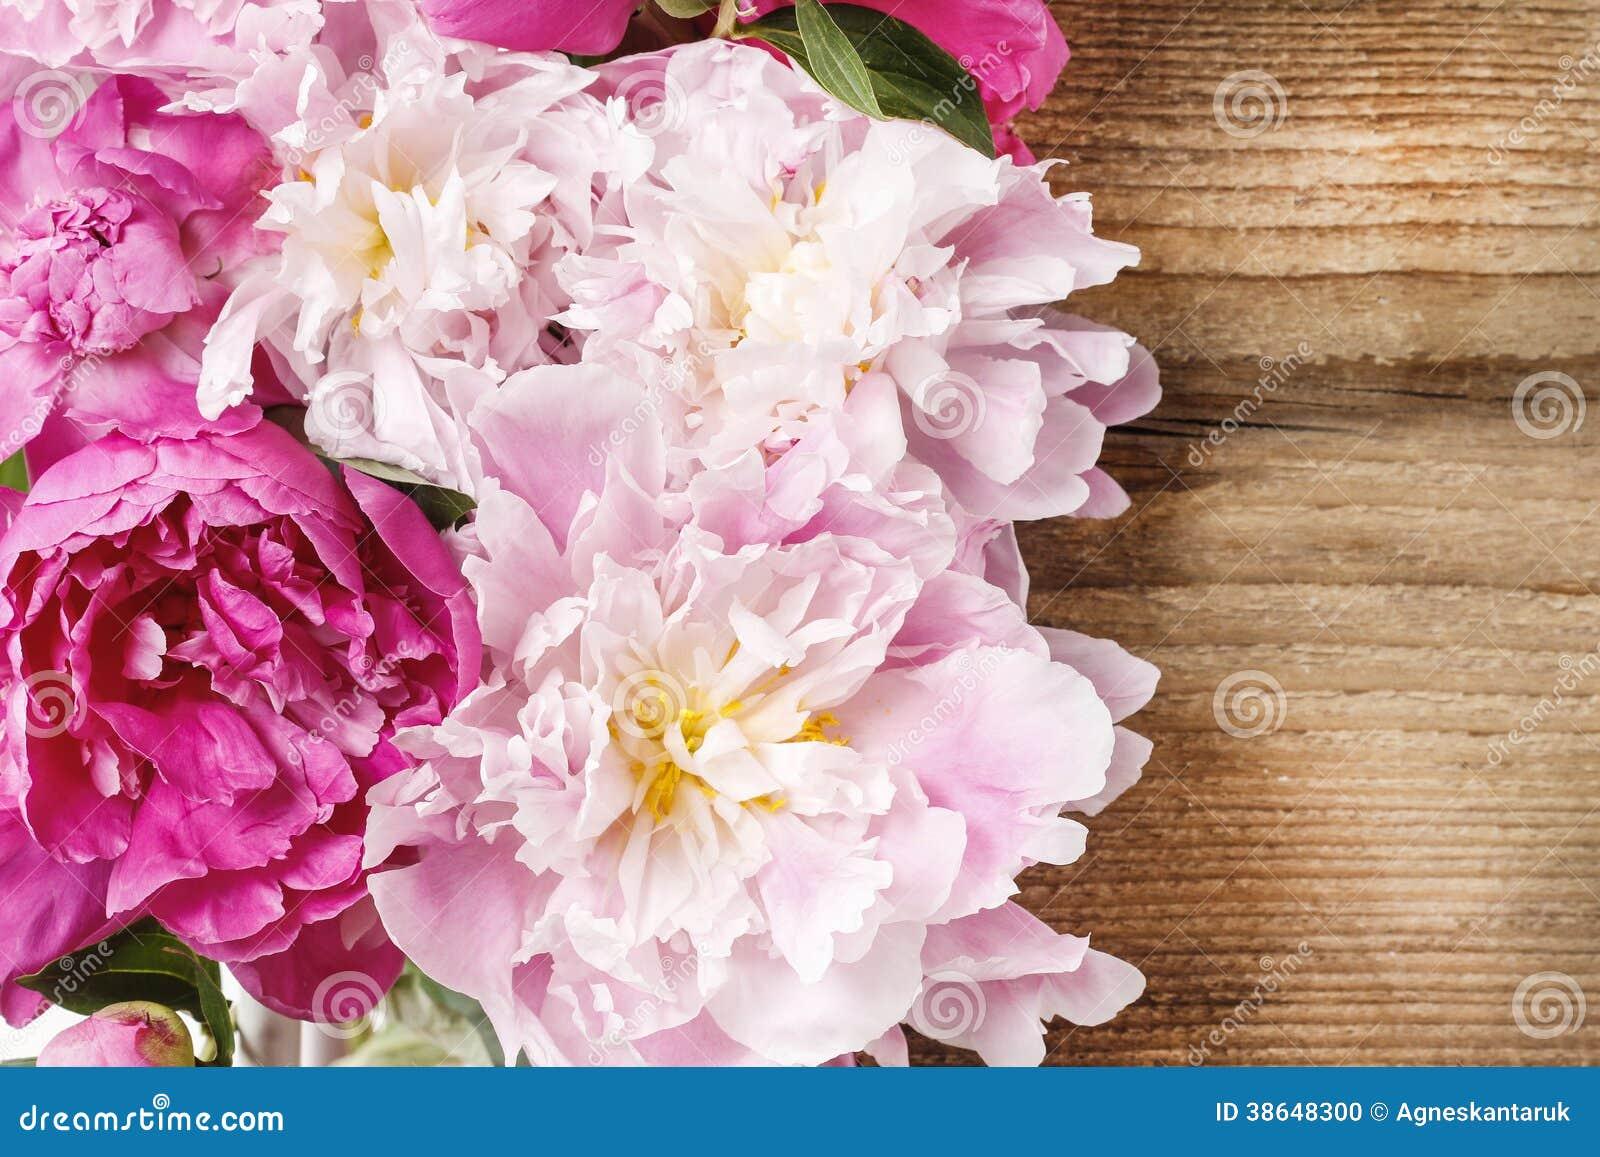 The Pink Peonies Stunning Pink Peonies On Rustic Wood Stock Photo  Image 40931662